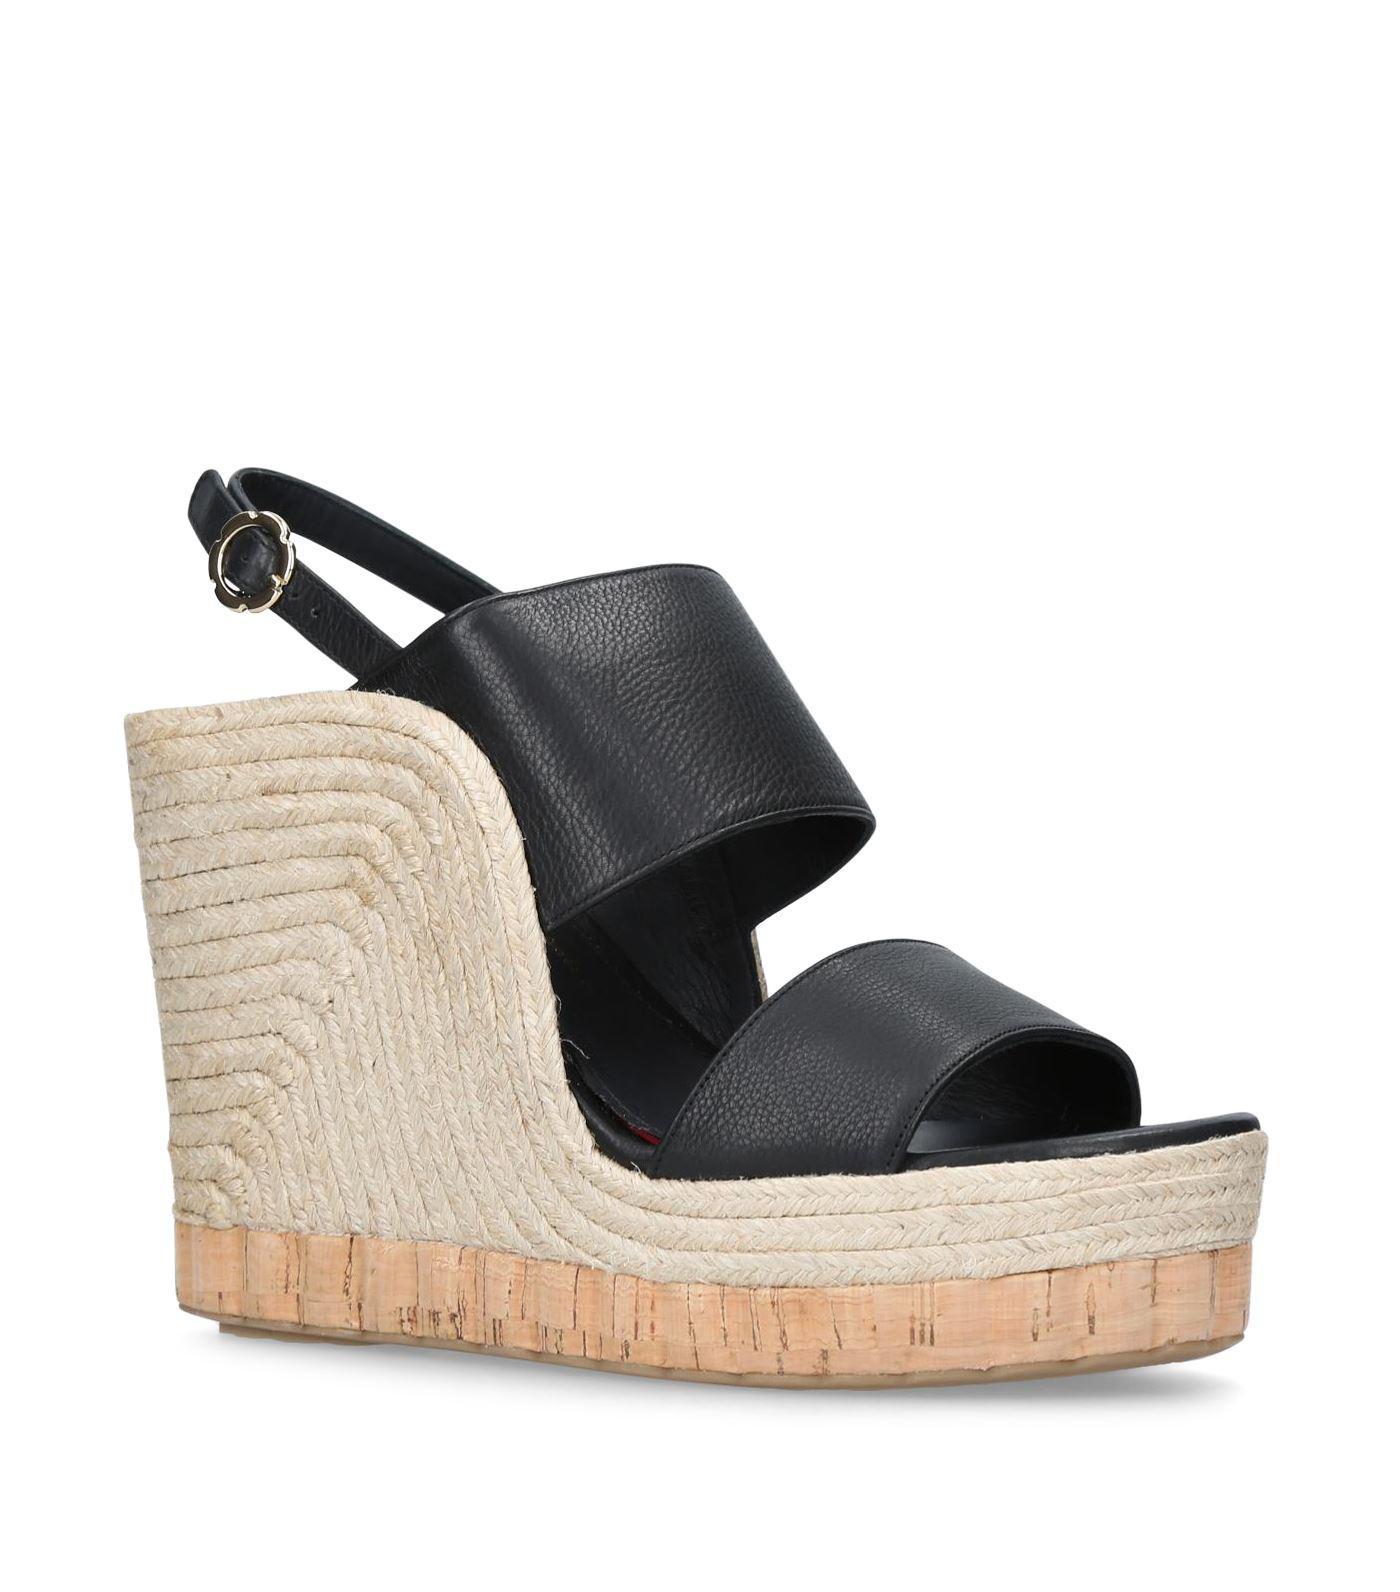 3e33cb76a51 Lyst - Ferragamo Maratea Espadrille Sandals in Black